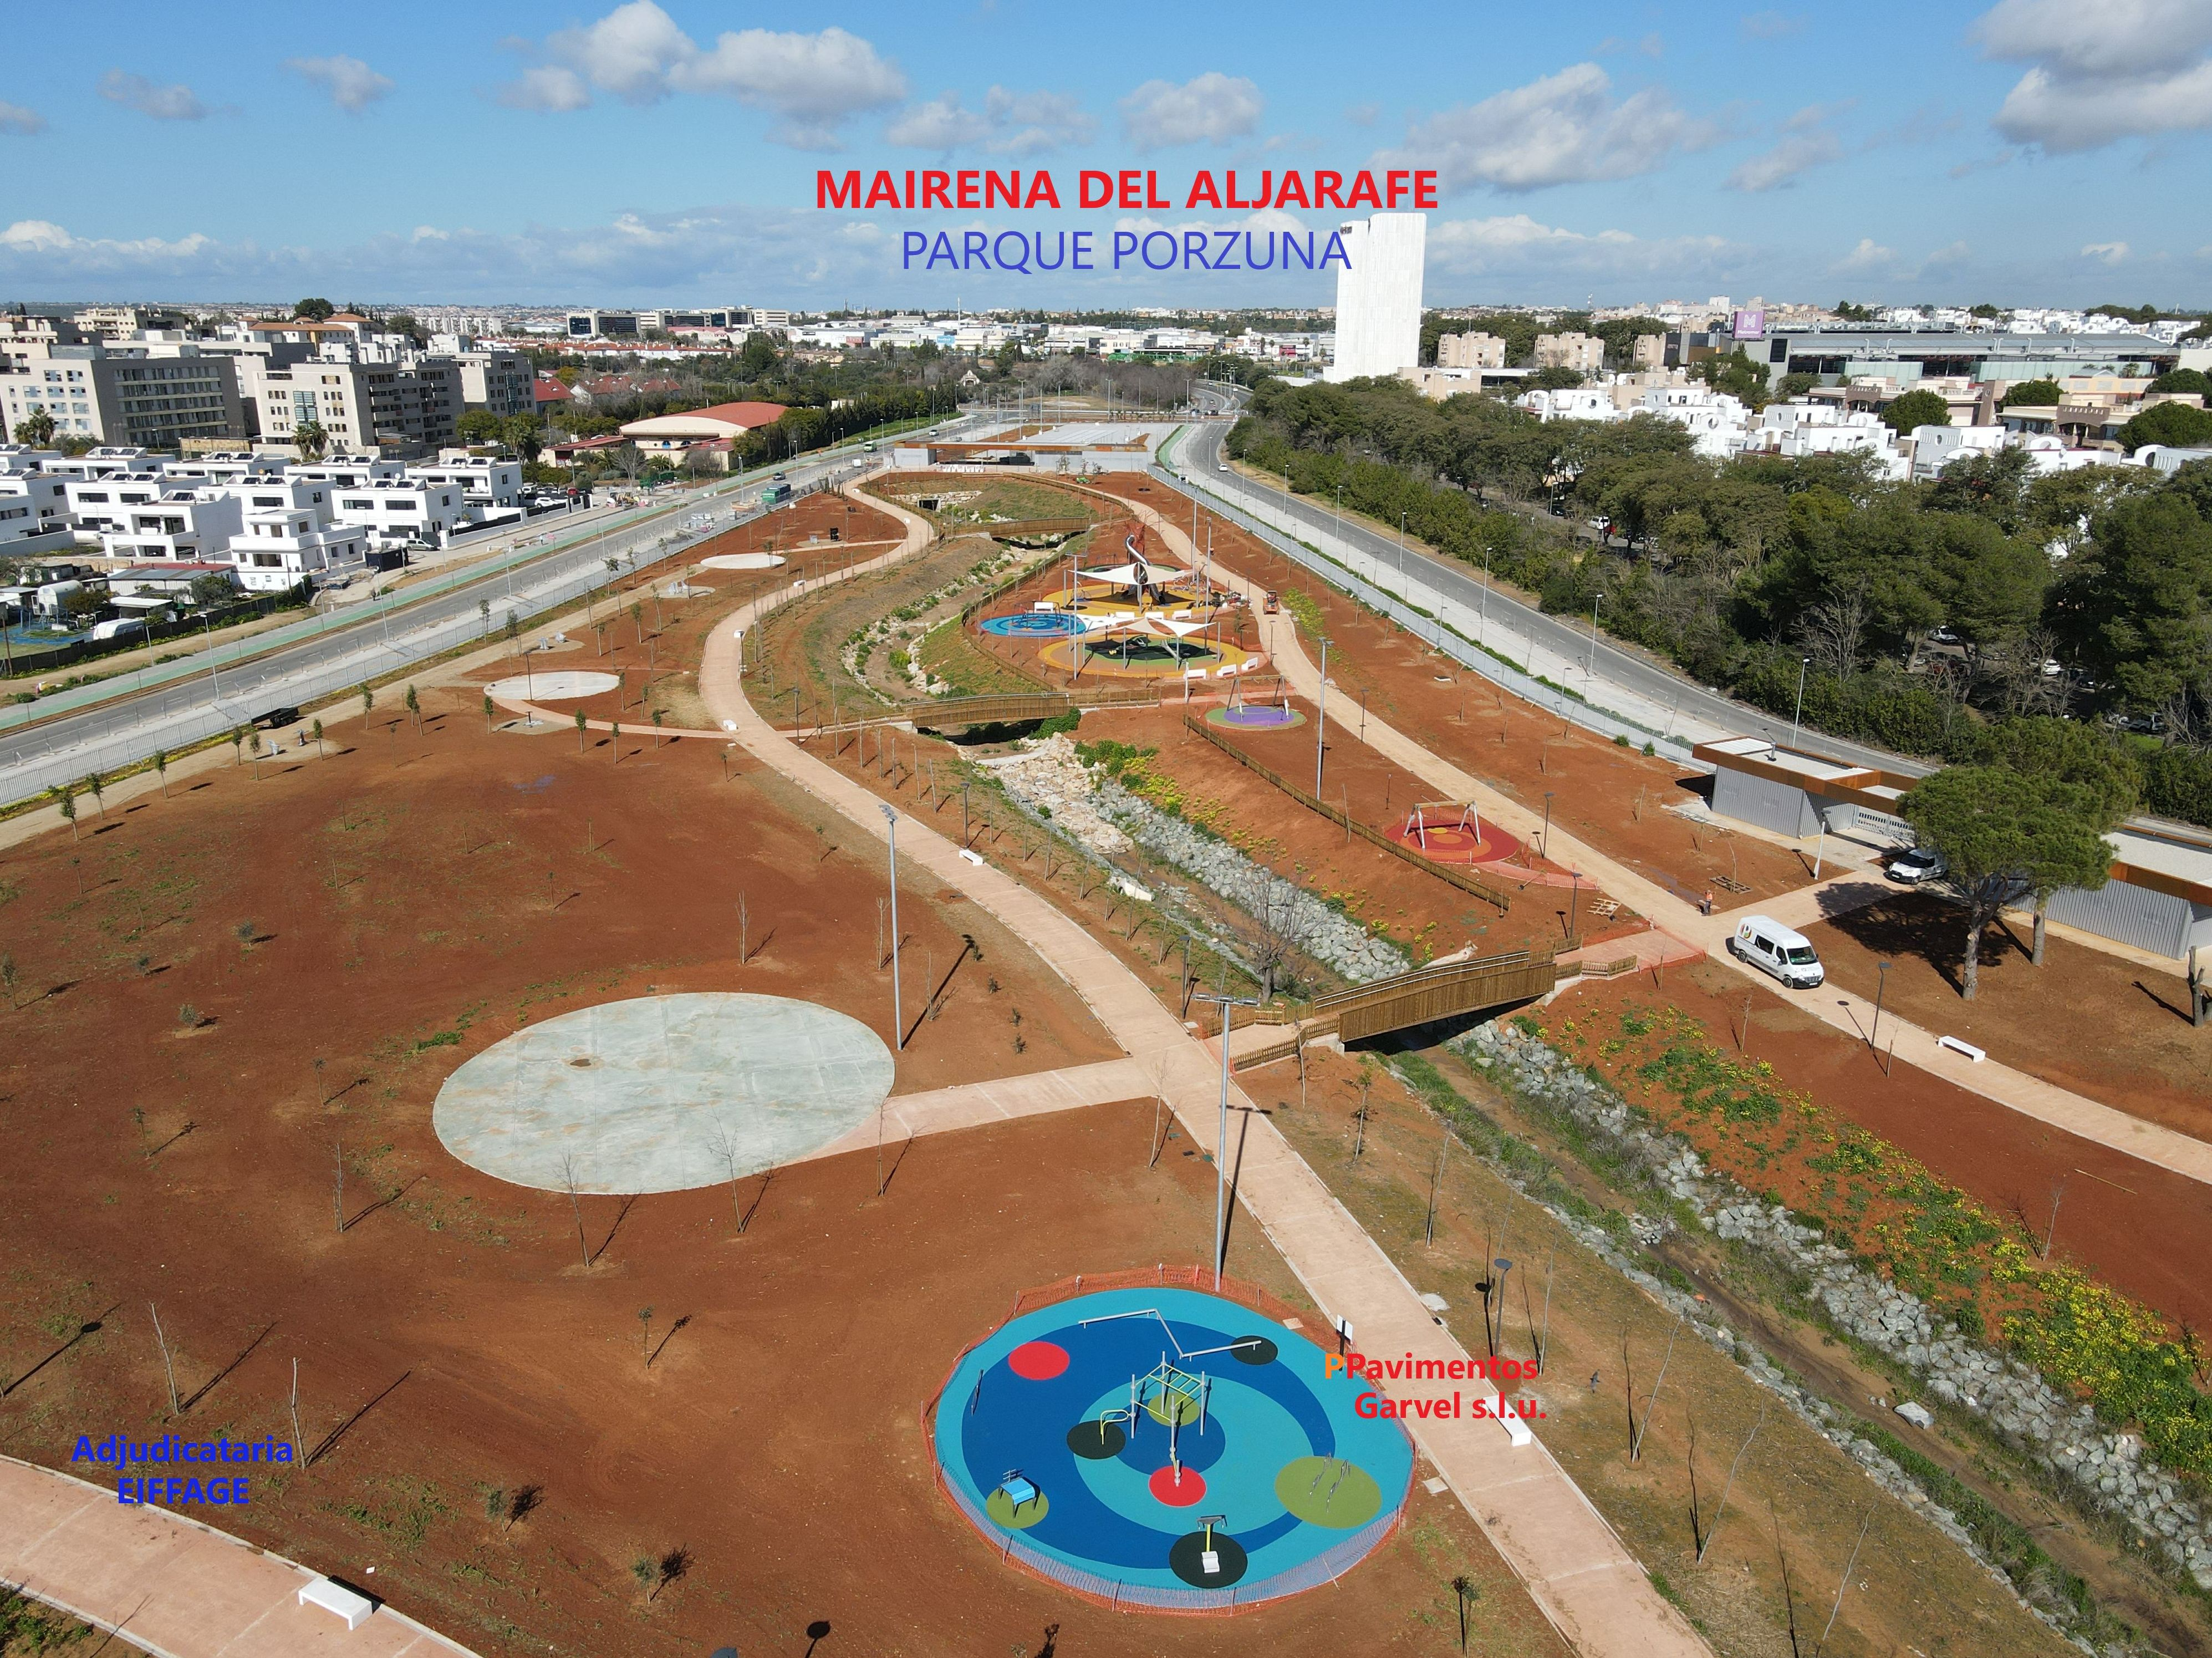 Foto 1 de Instalación de pavimentos de caucho para parques infantiles en Las Cabezas de San Juan   Pavimentos Garvel